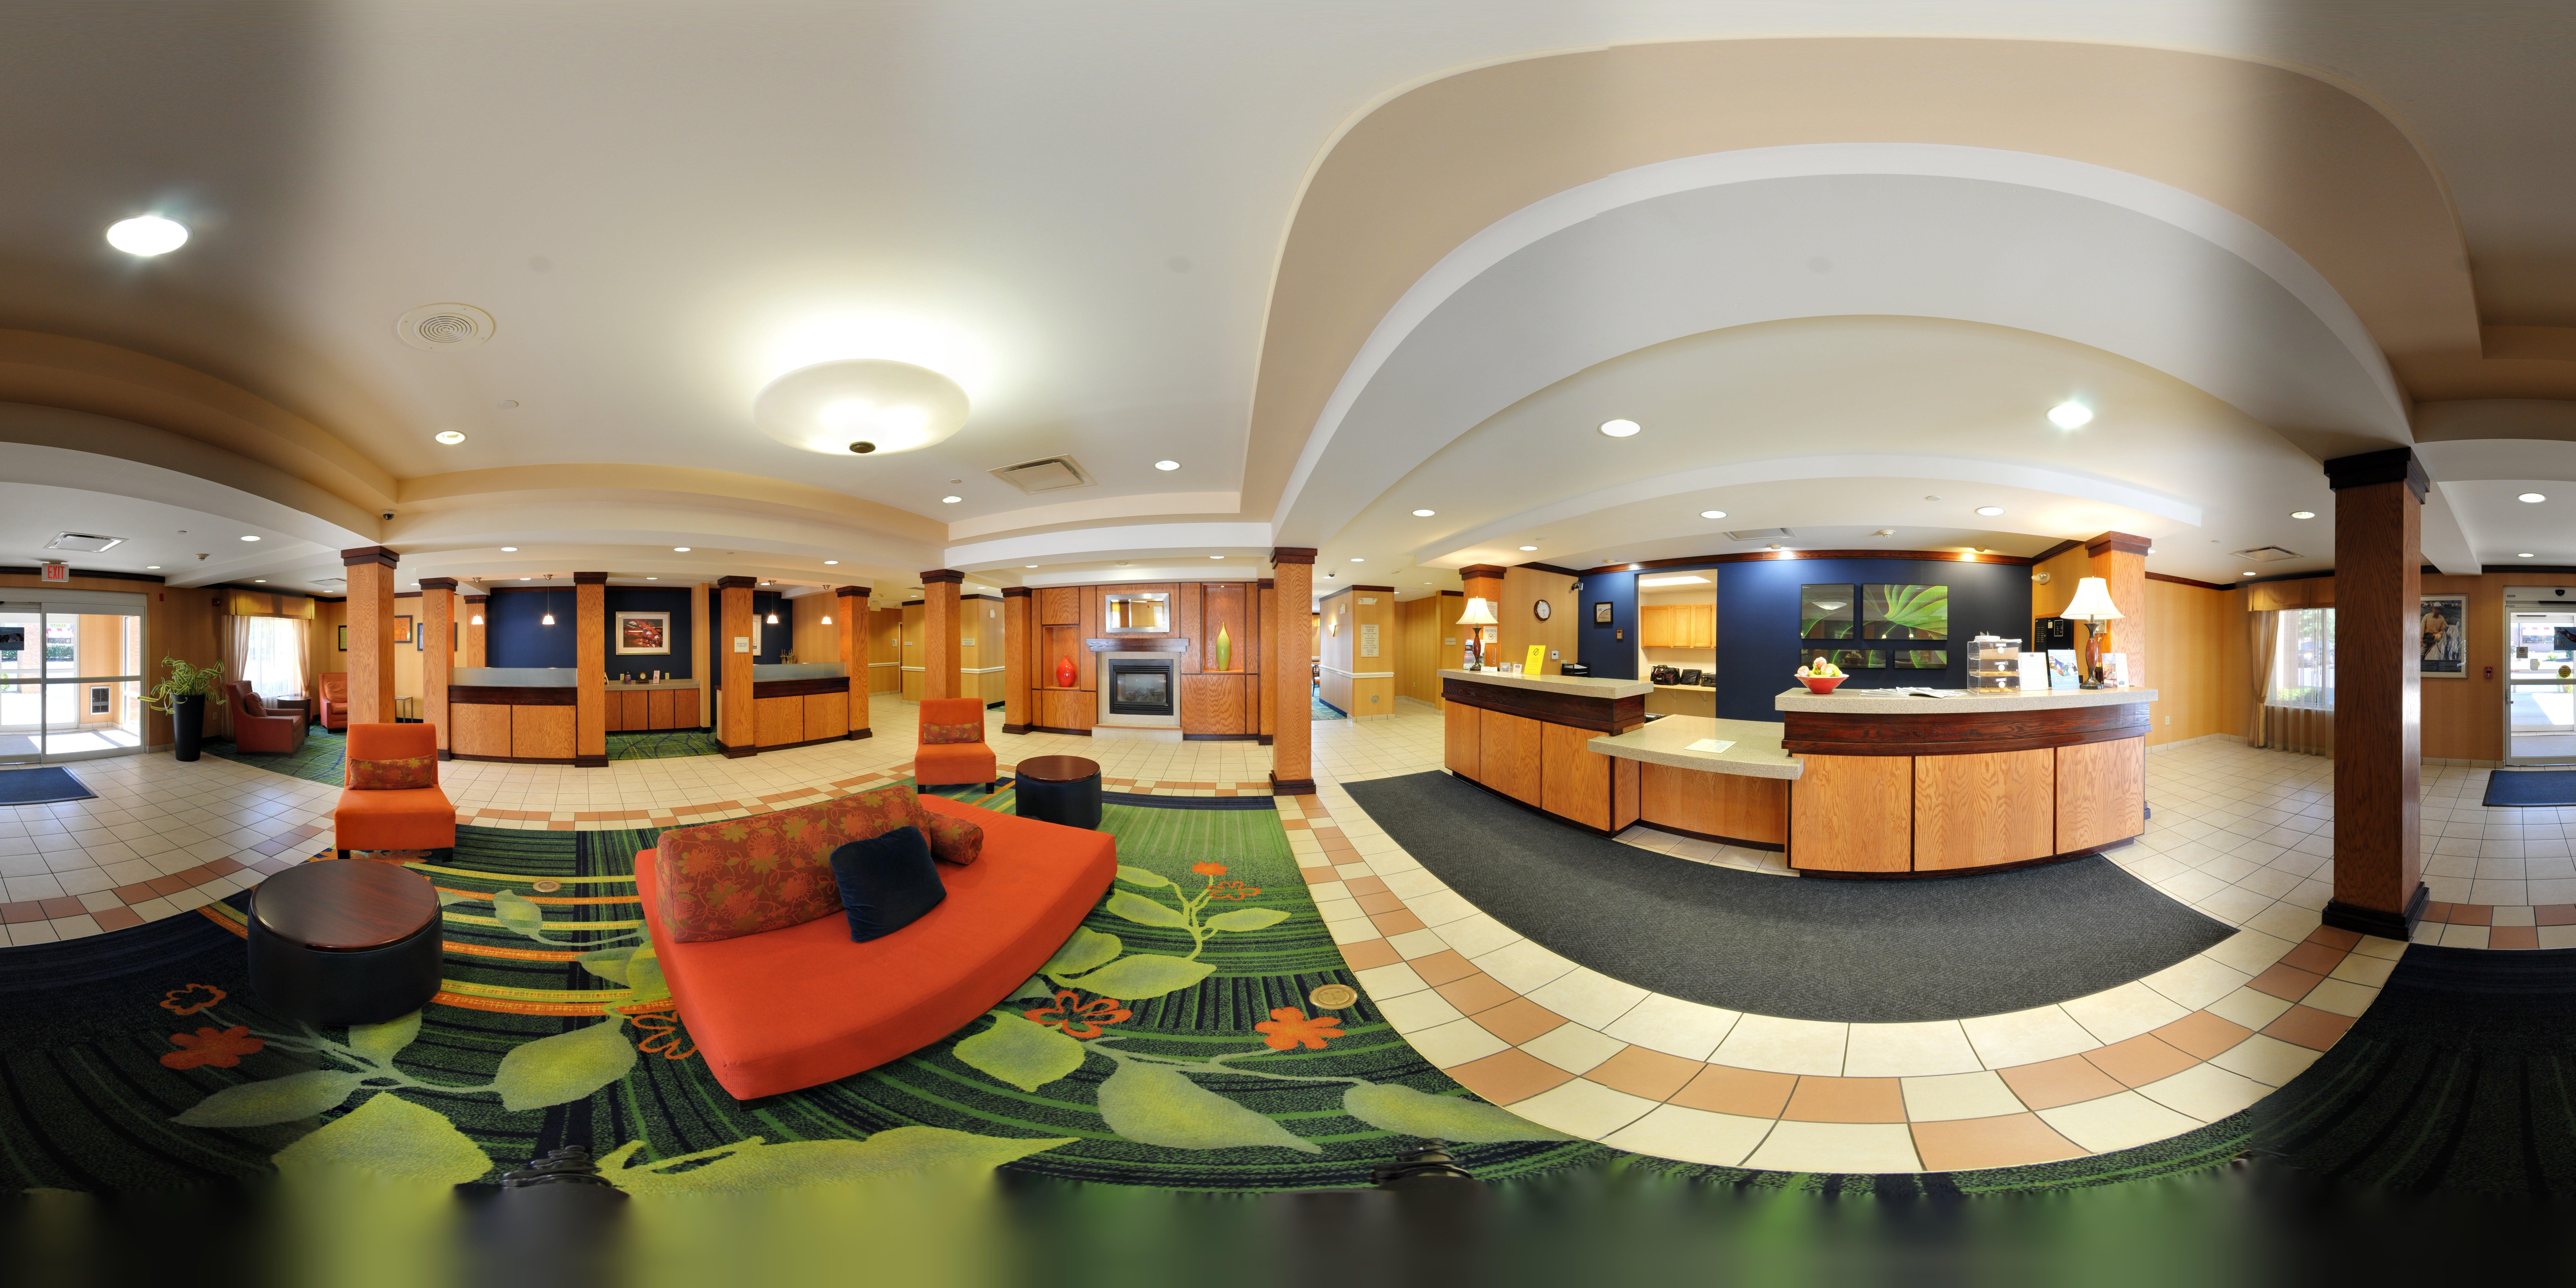 Fairfield Inn & Suites by Marriott Akron South image 28